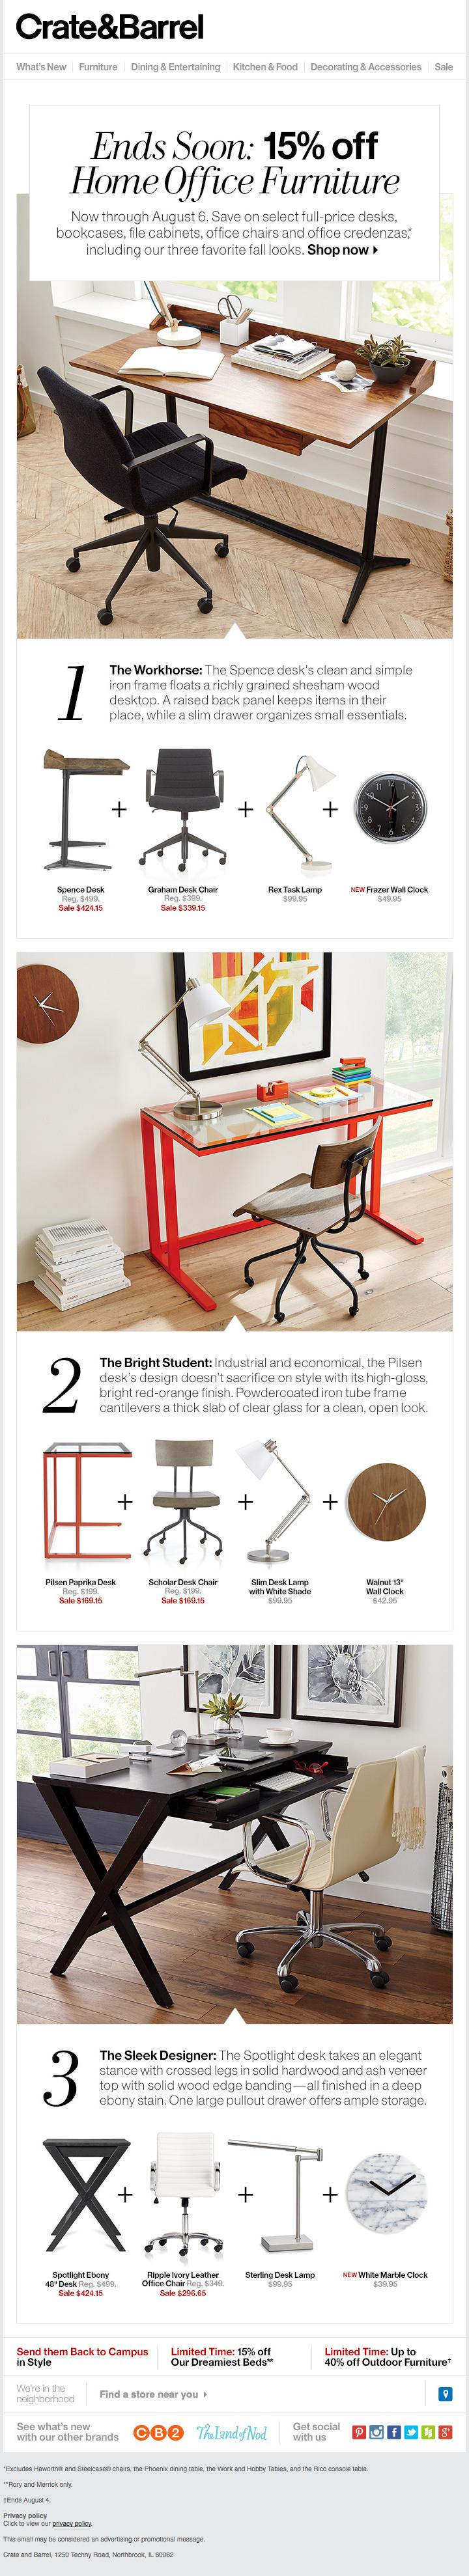 C&B - 15% off Home Office Furniture Sale   e@ds   Pinterest